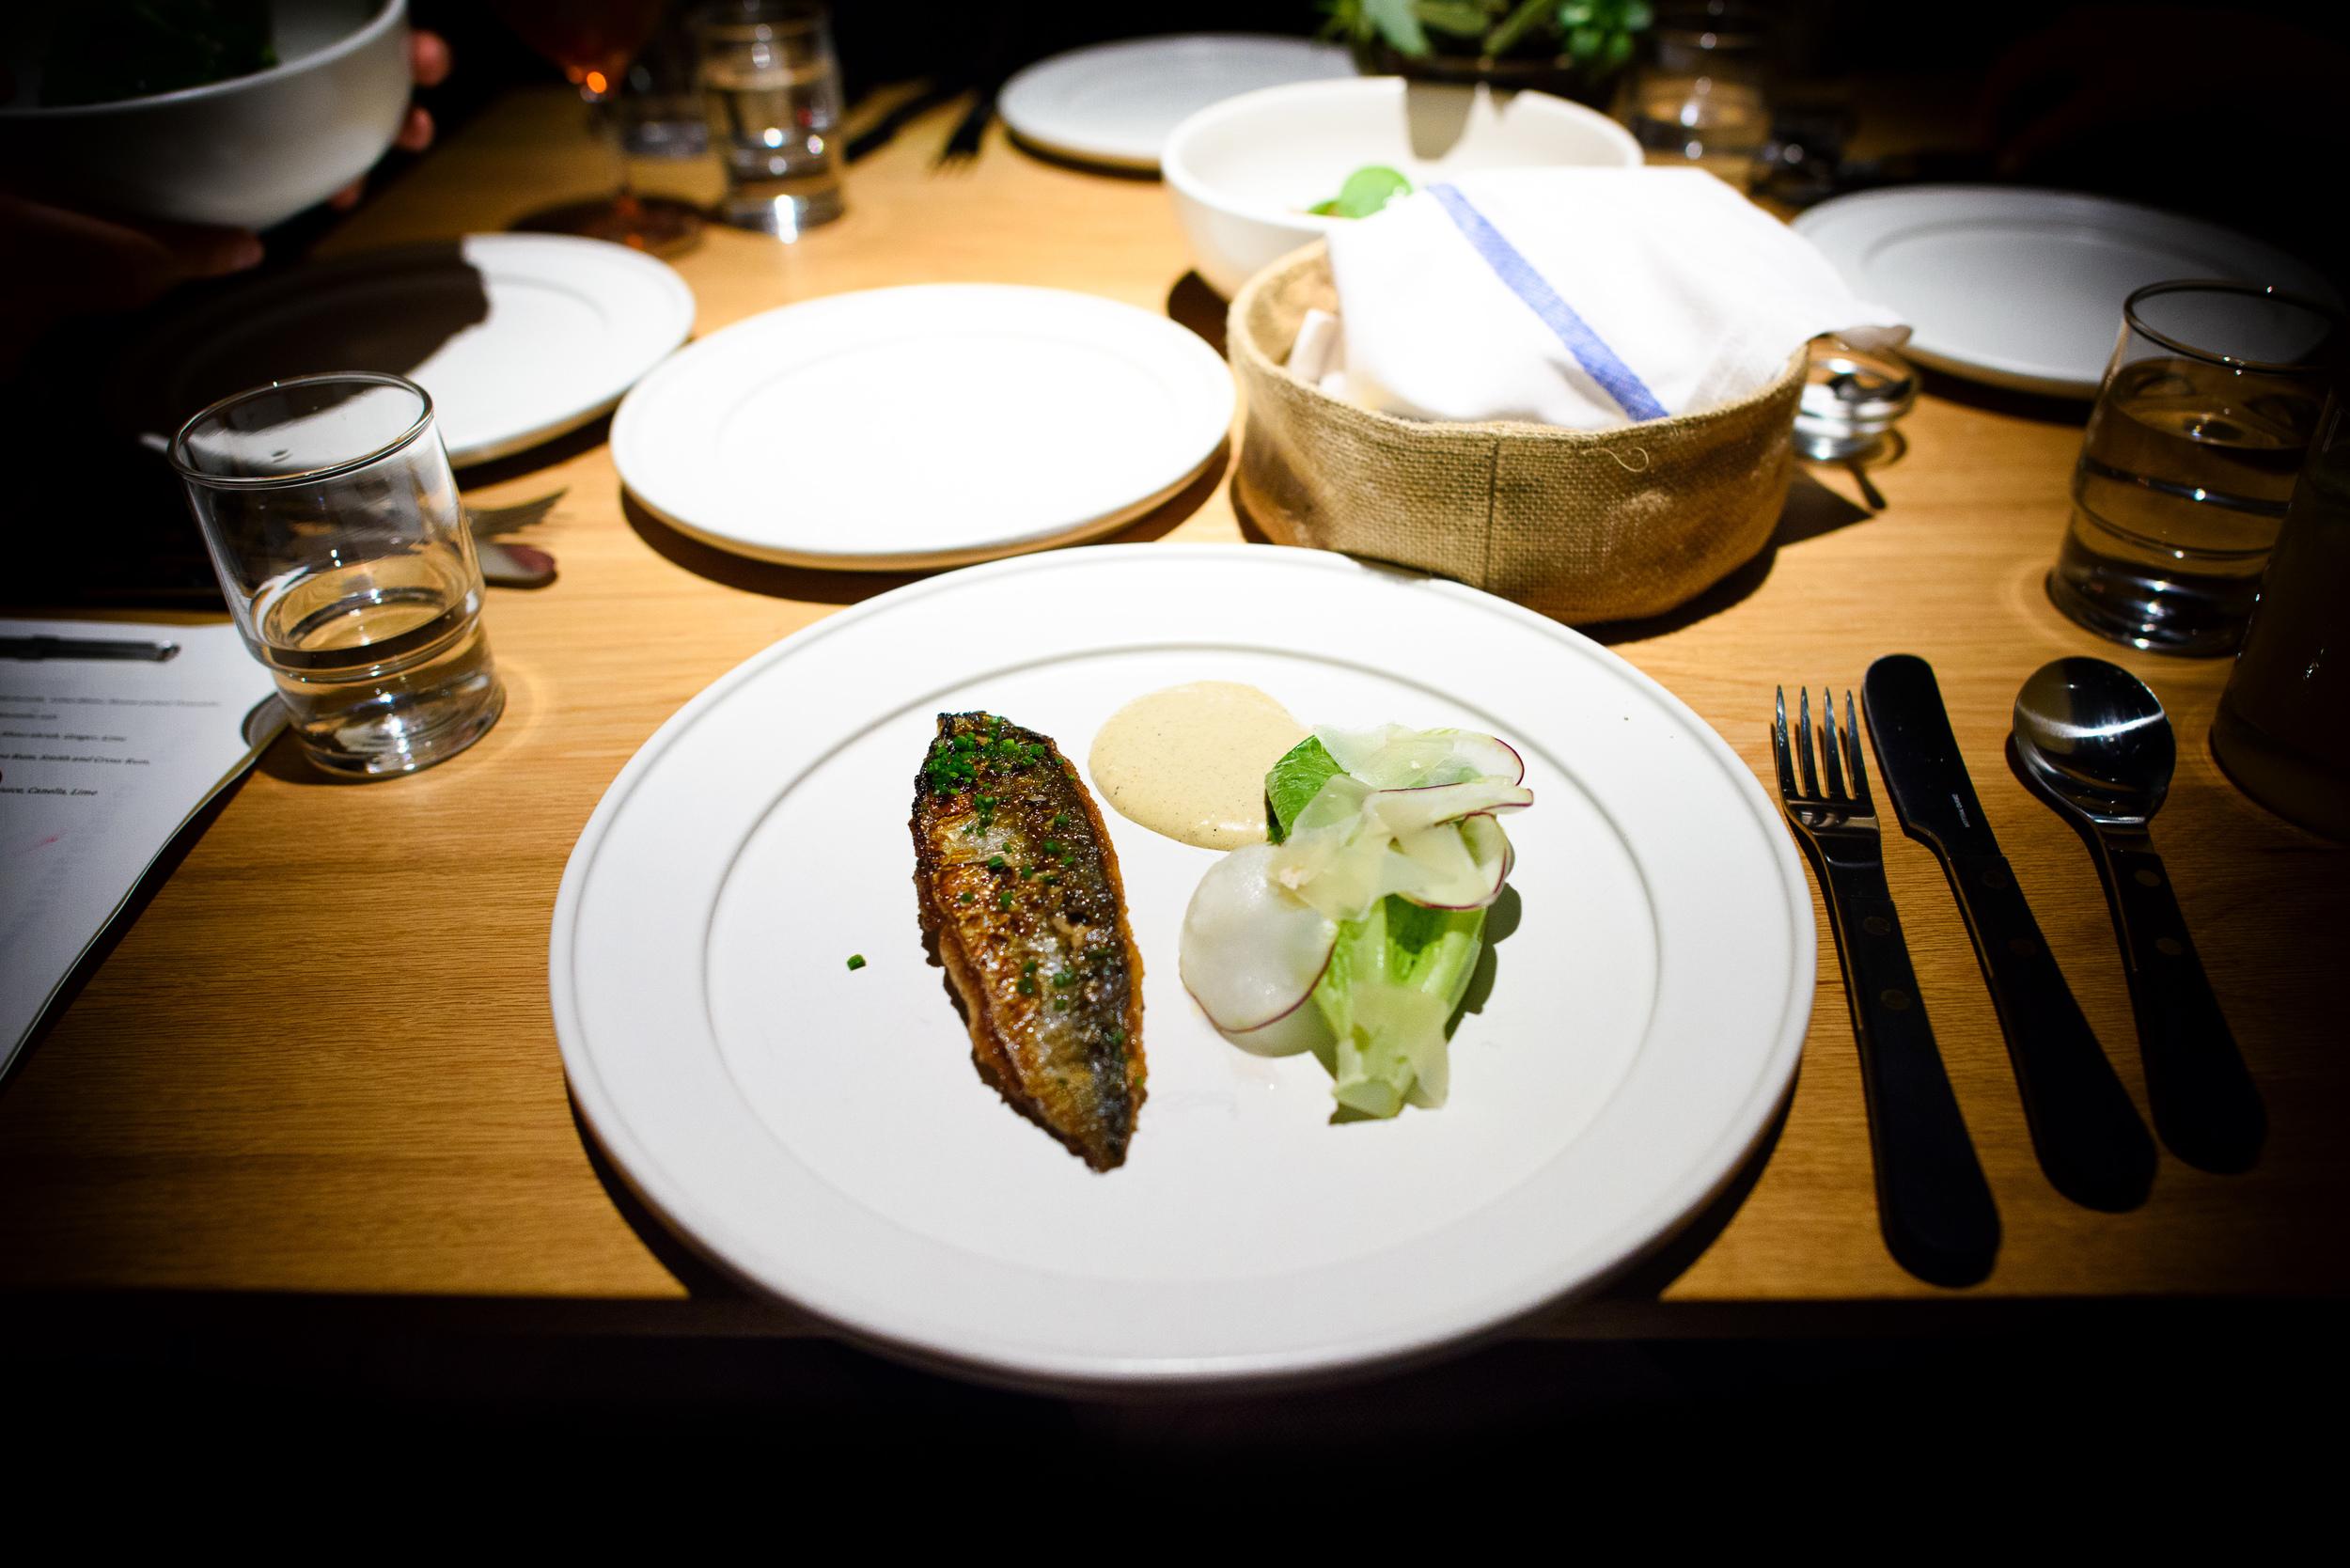 Boston mackerel, kohlrabi, caesar